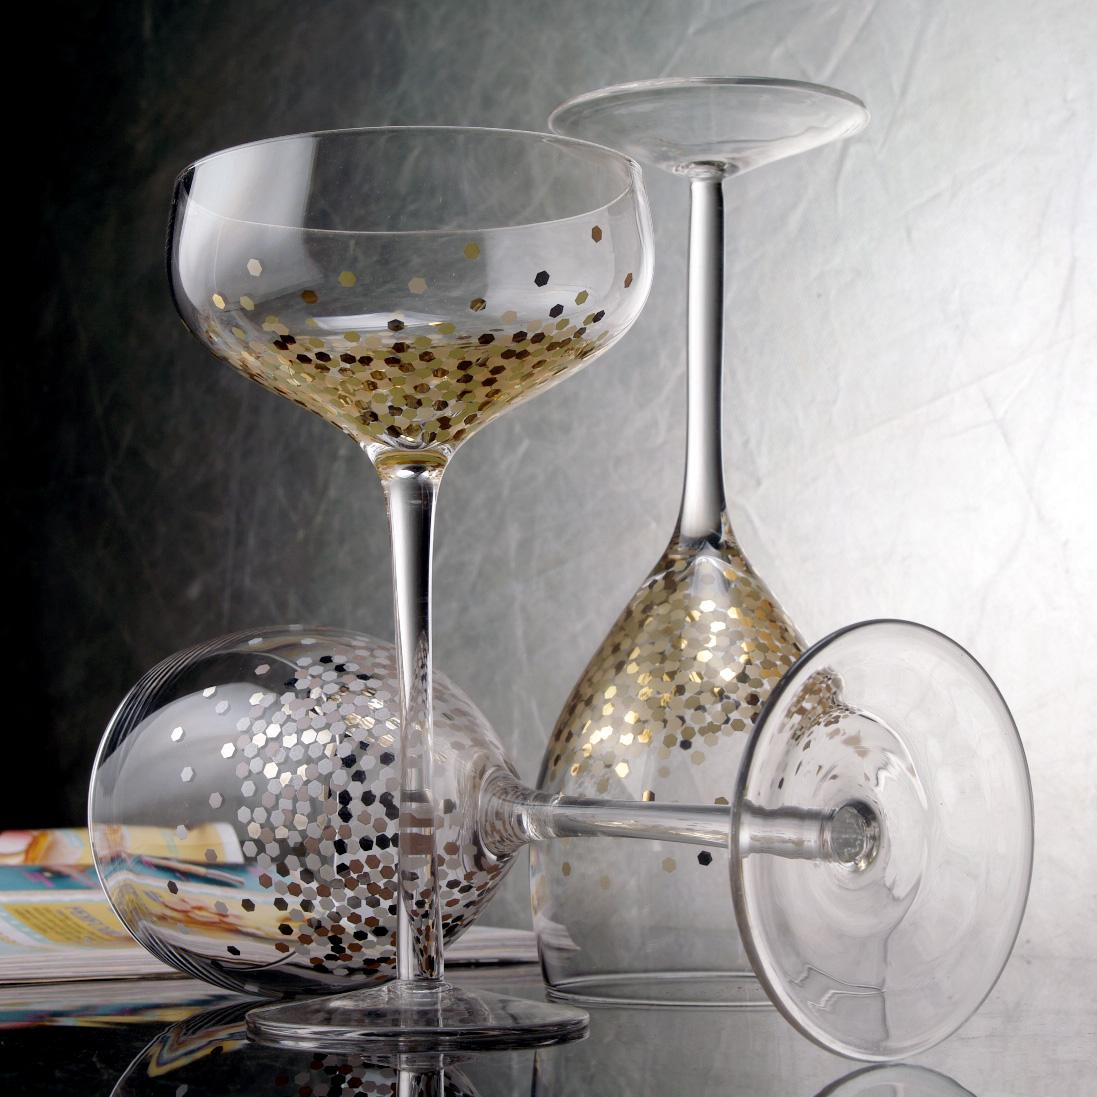 il glasses birthday custom wine fullxfull glitter decorative duck cup decor disney donald listing lover gifts